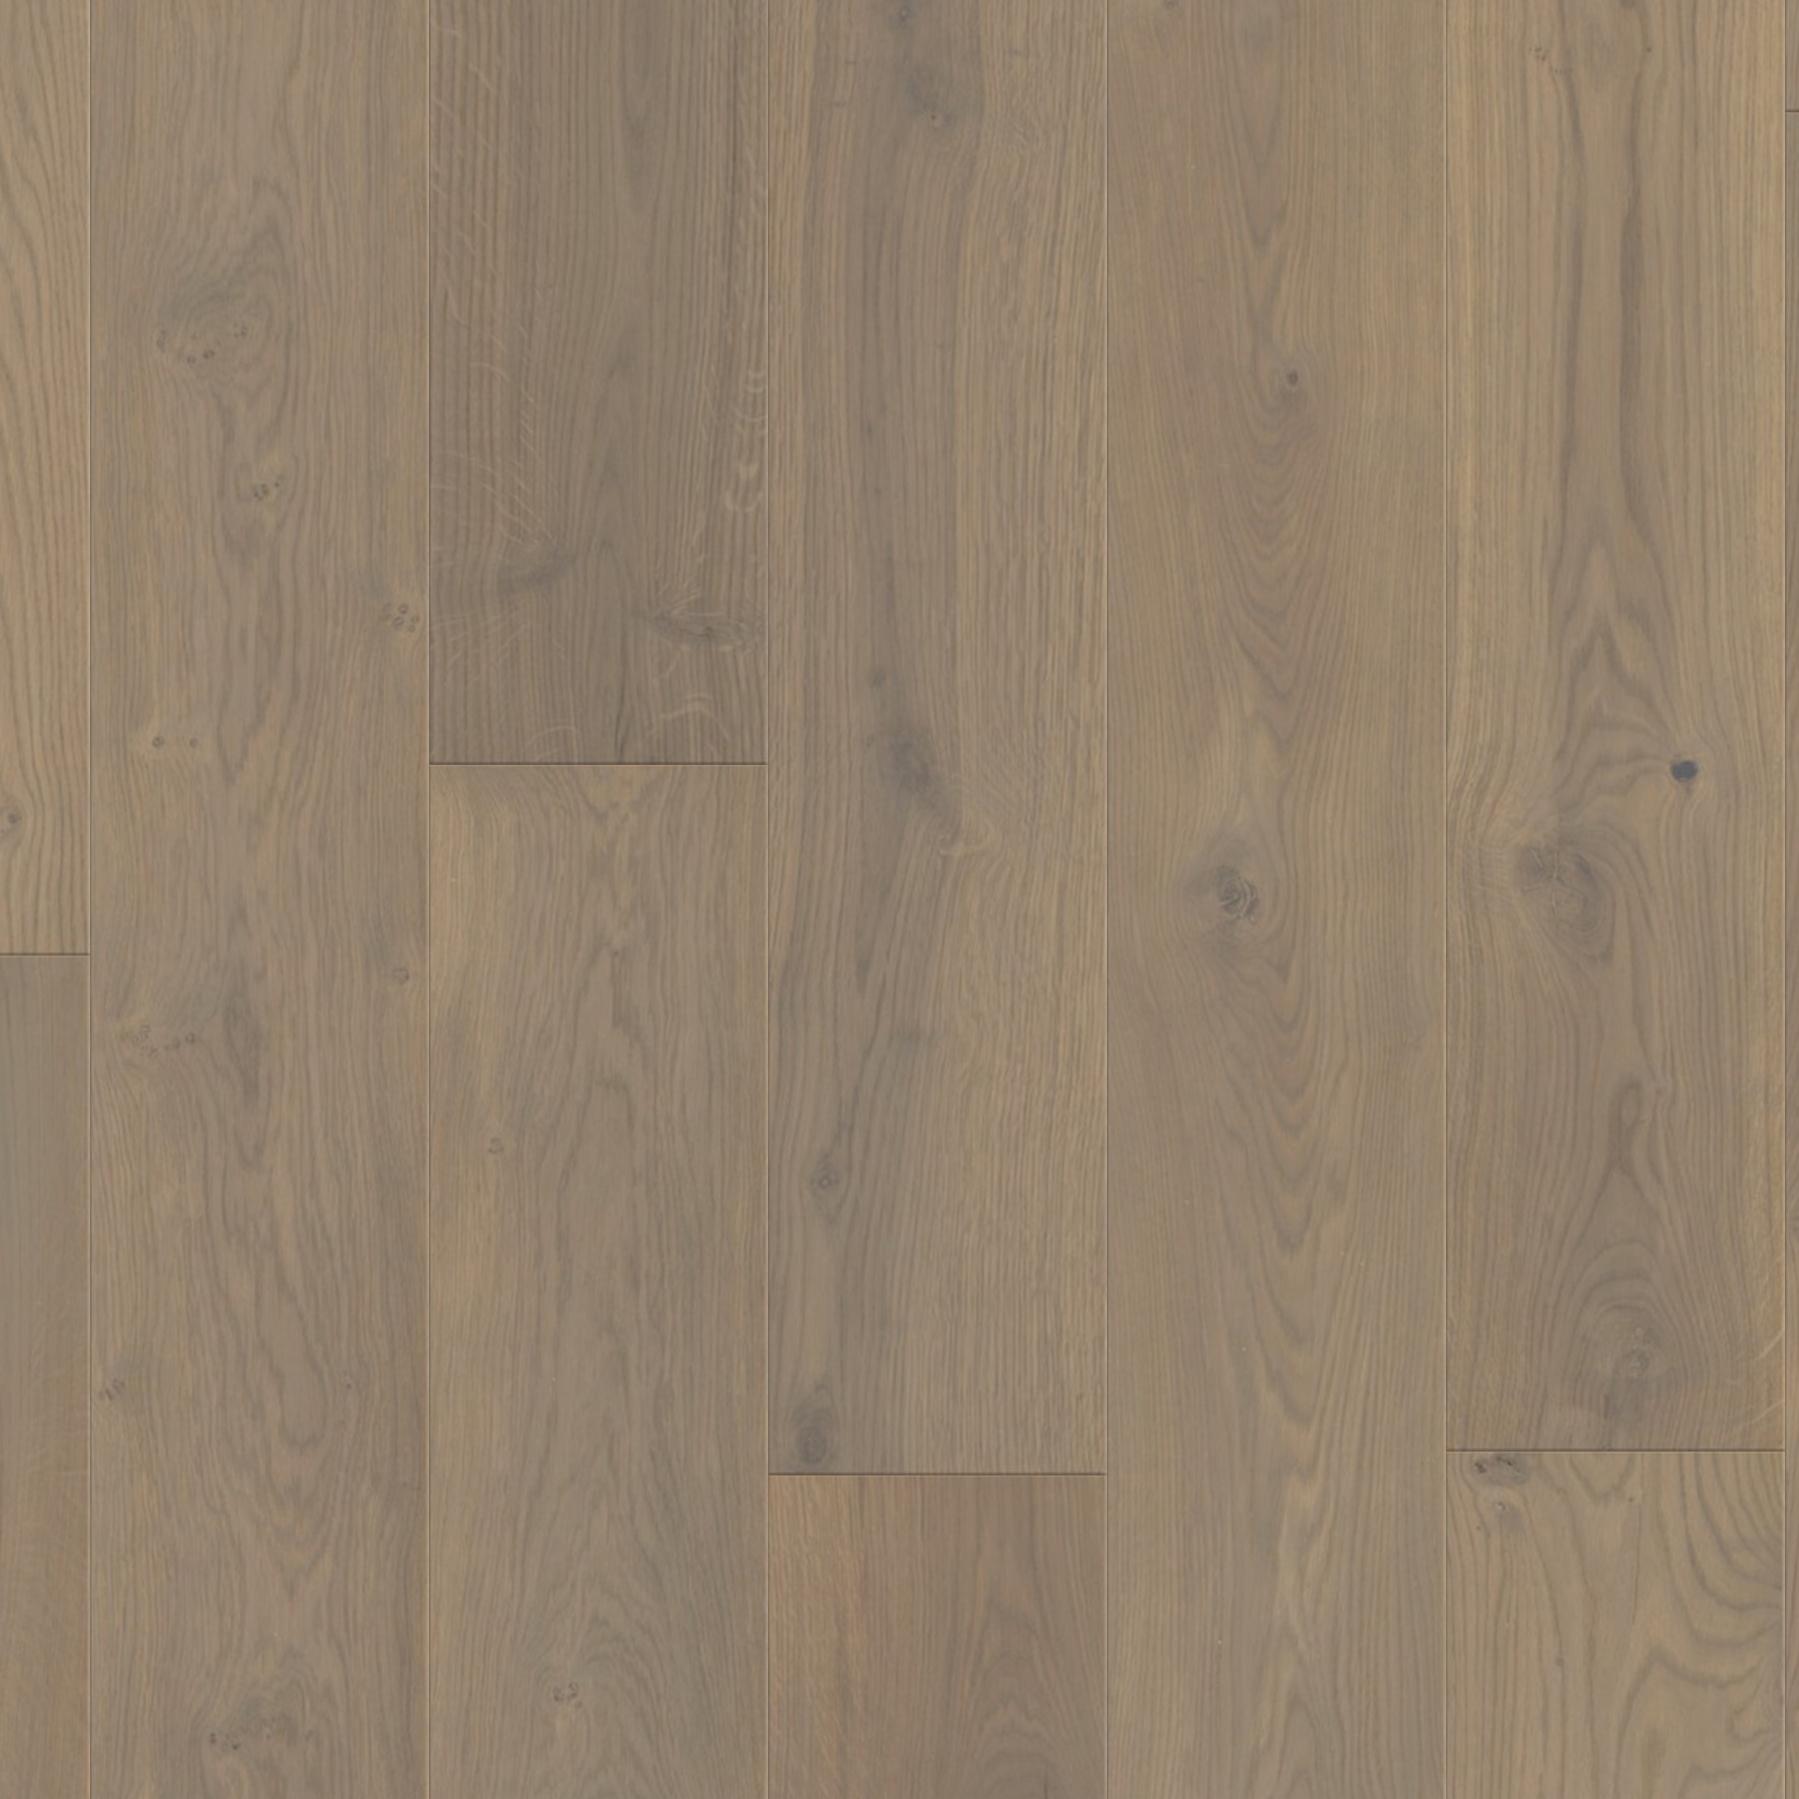 Platinum Grey: HPPC (2970)